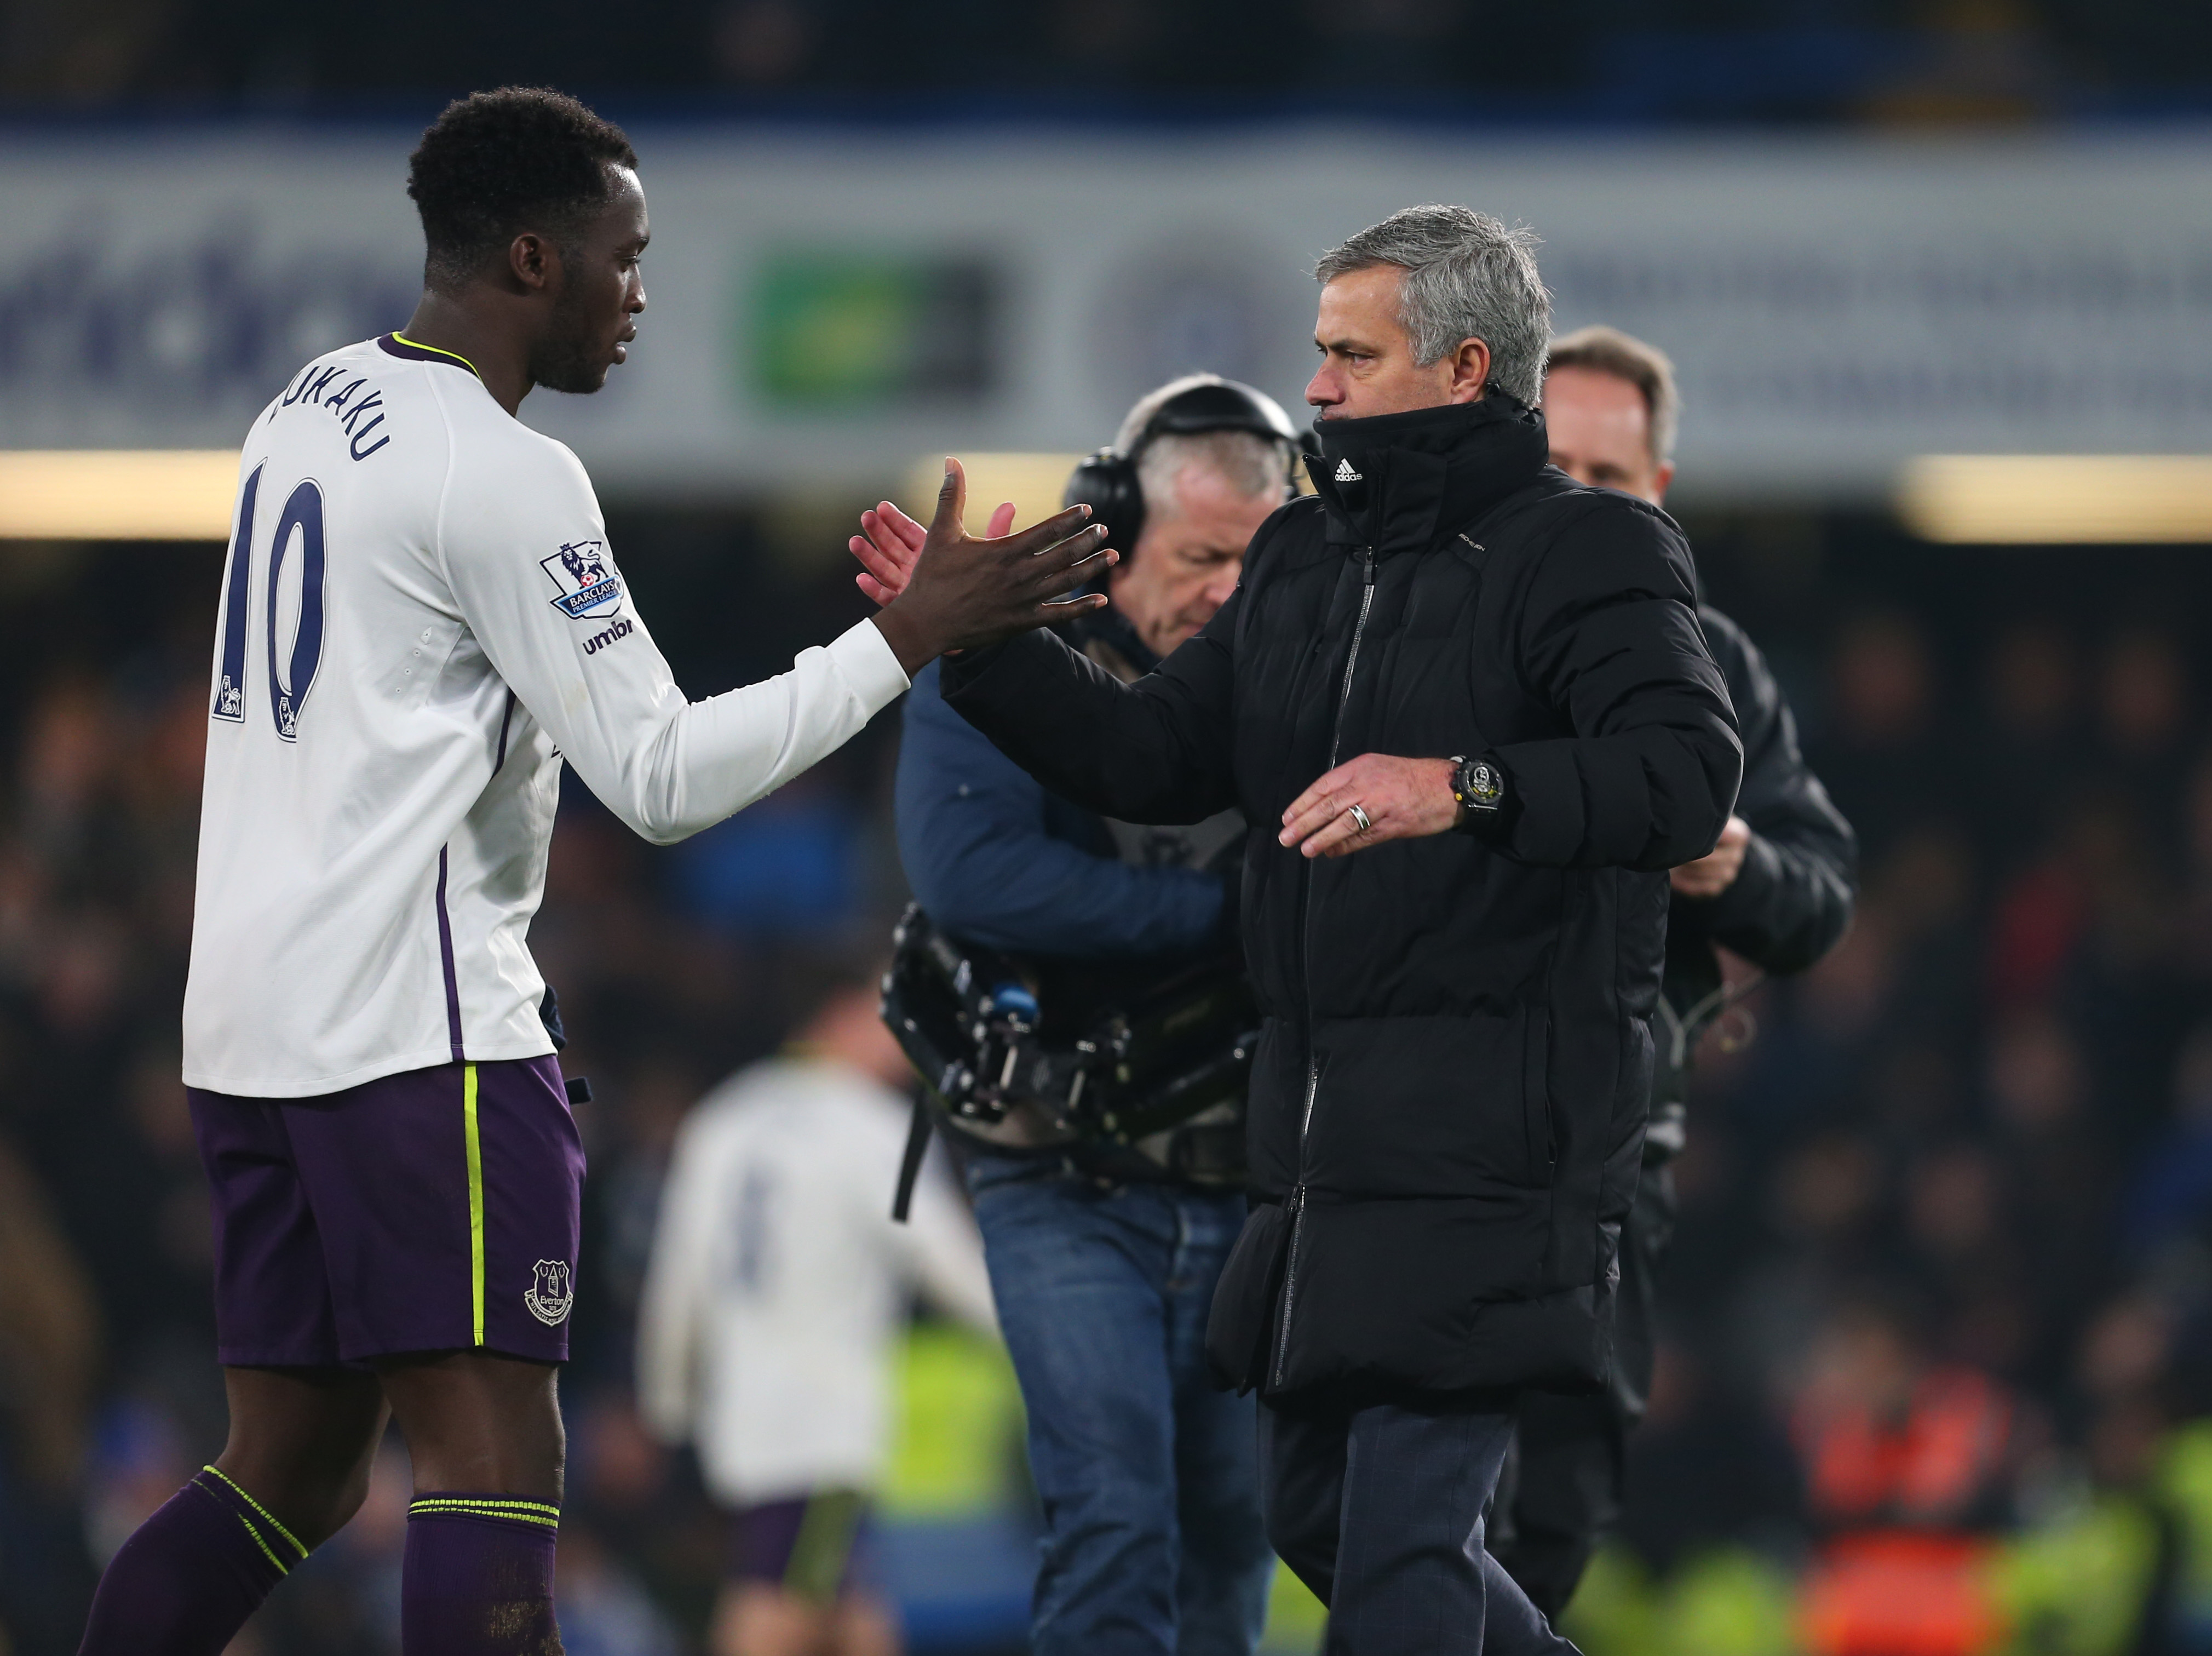 Romelu Lukaku keen to redeem himself under Jose Mourinho with Manchester United transfer